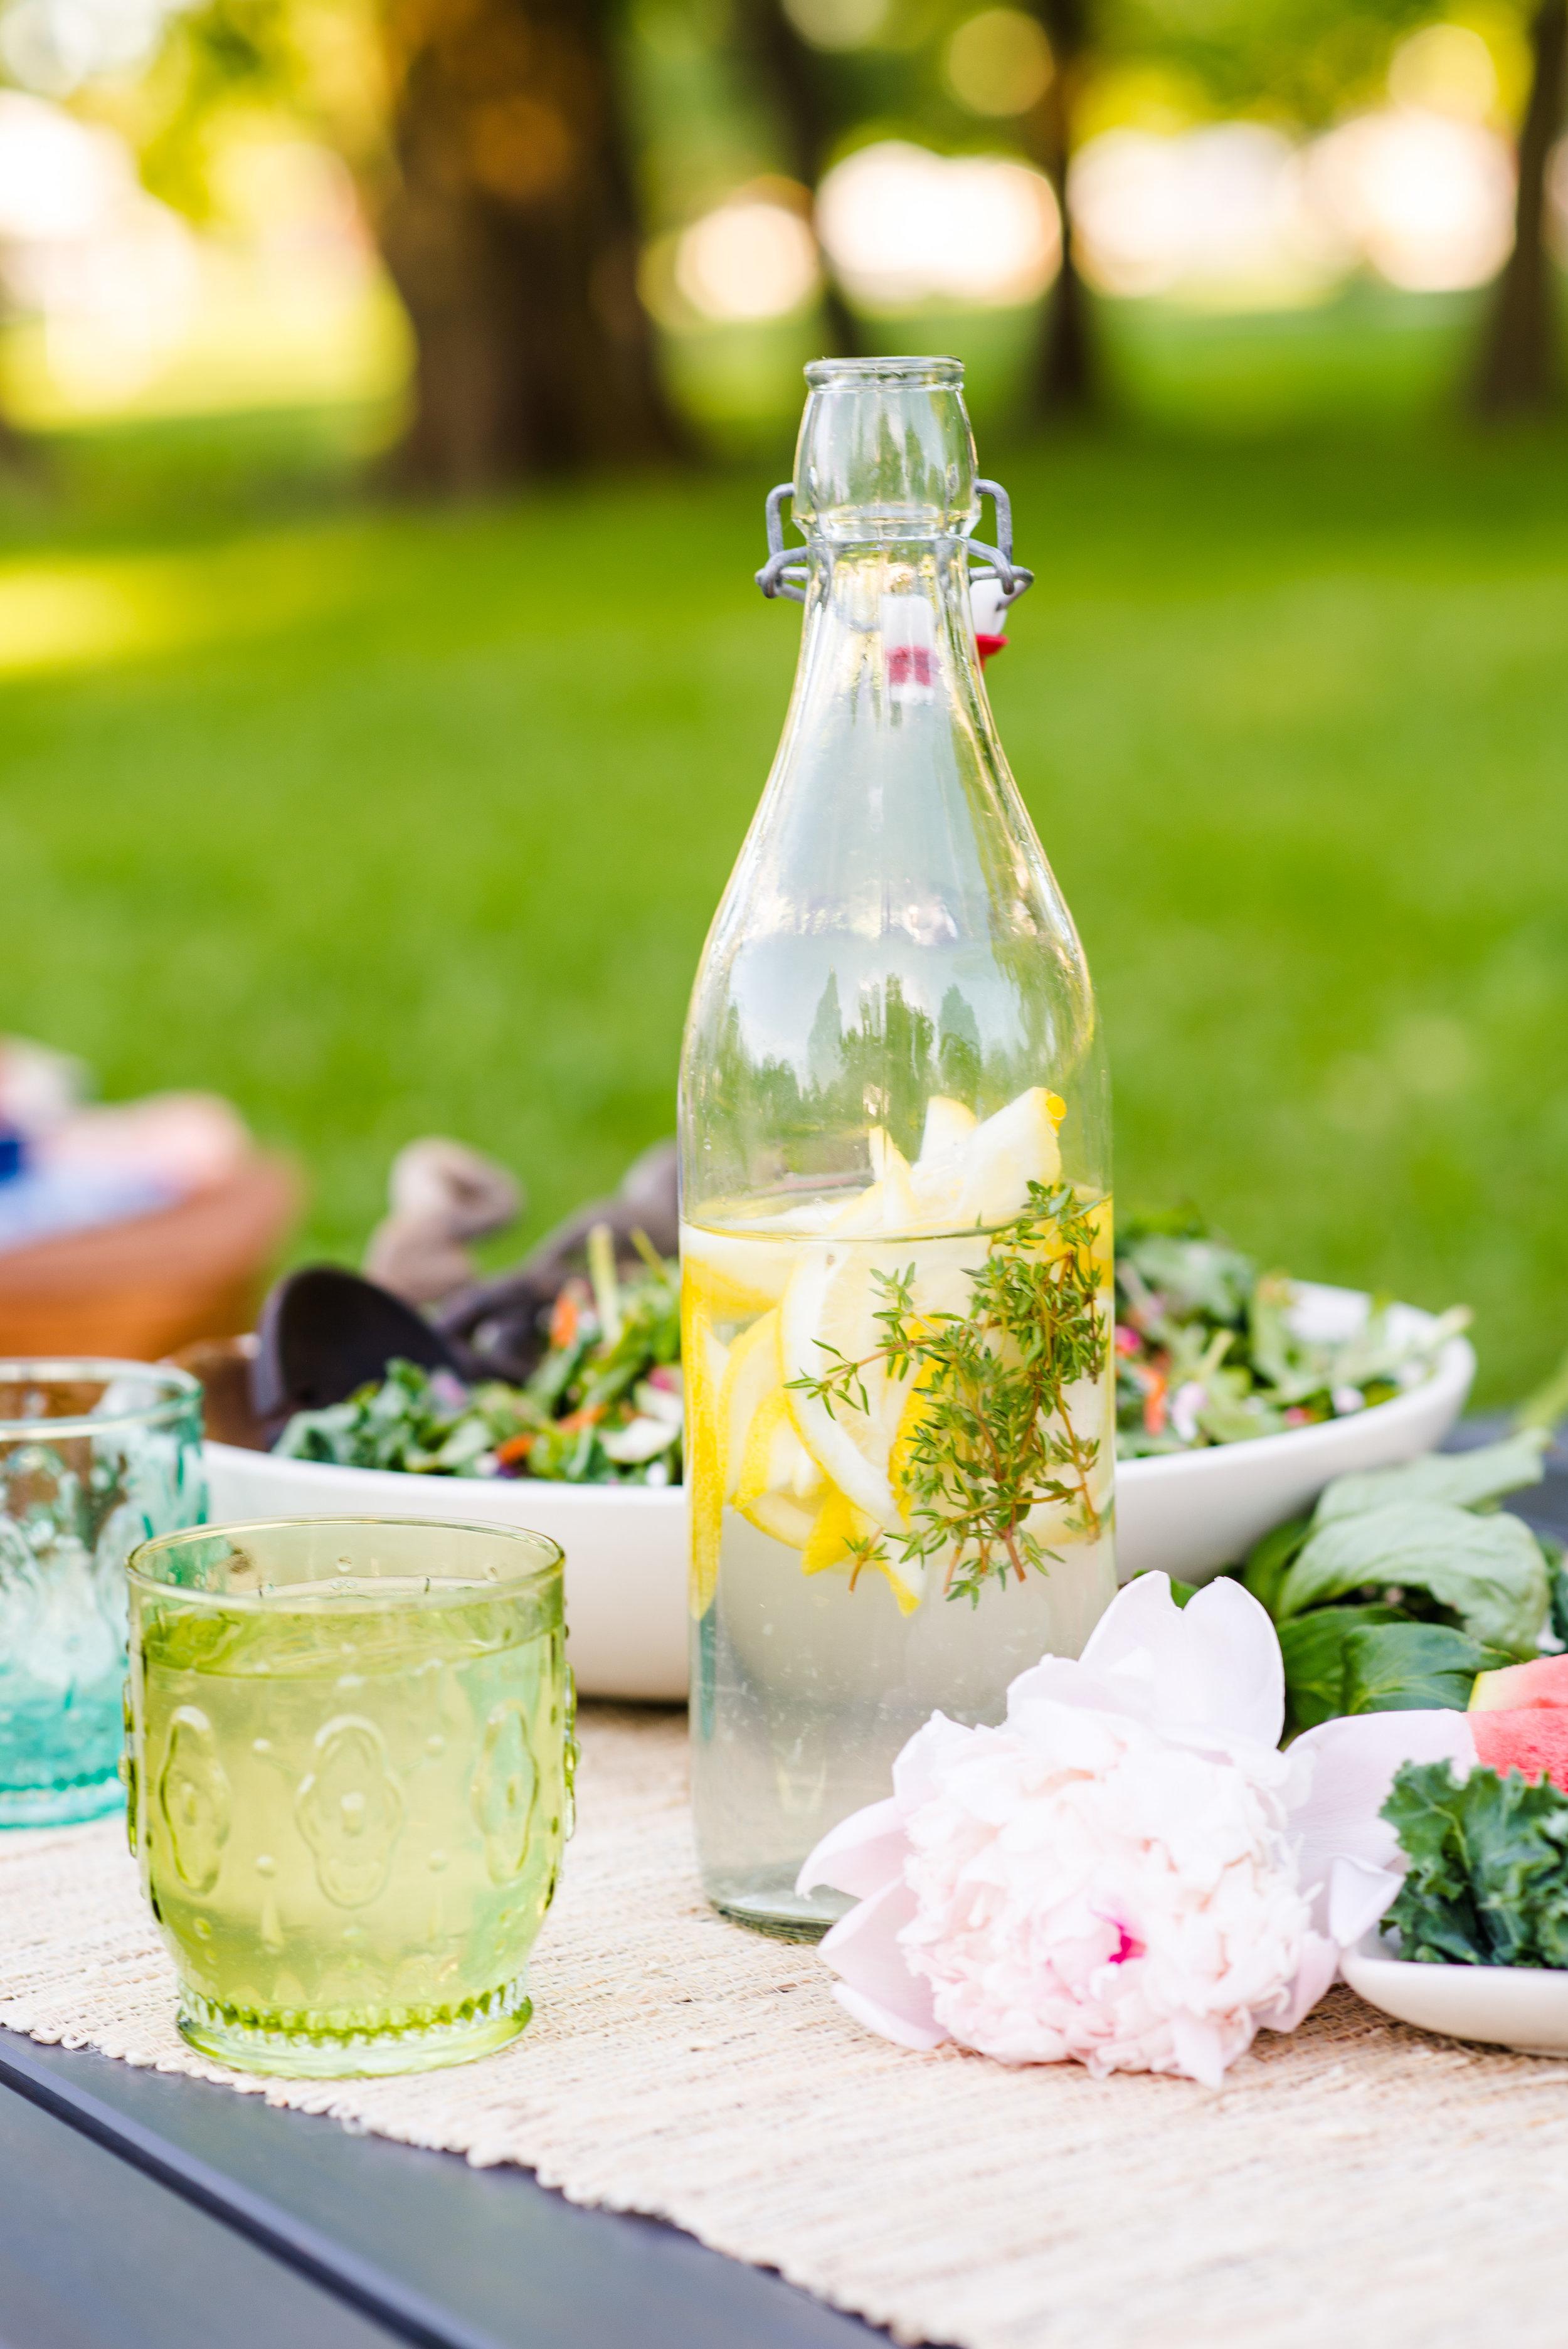 picnic_drinks_flavored_water.jpg